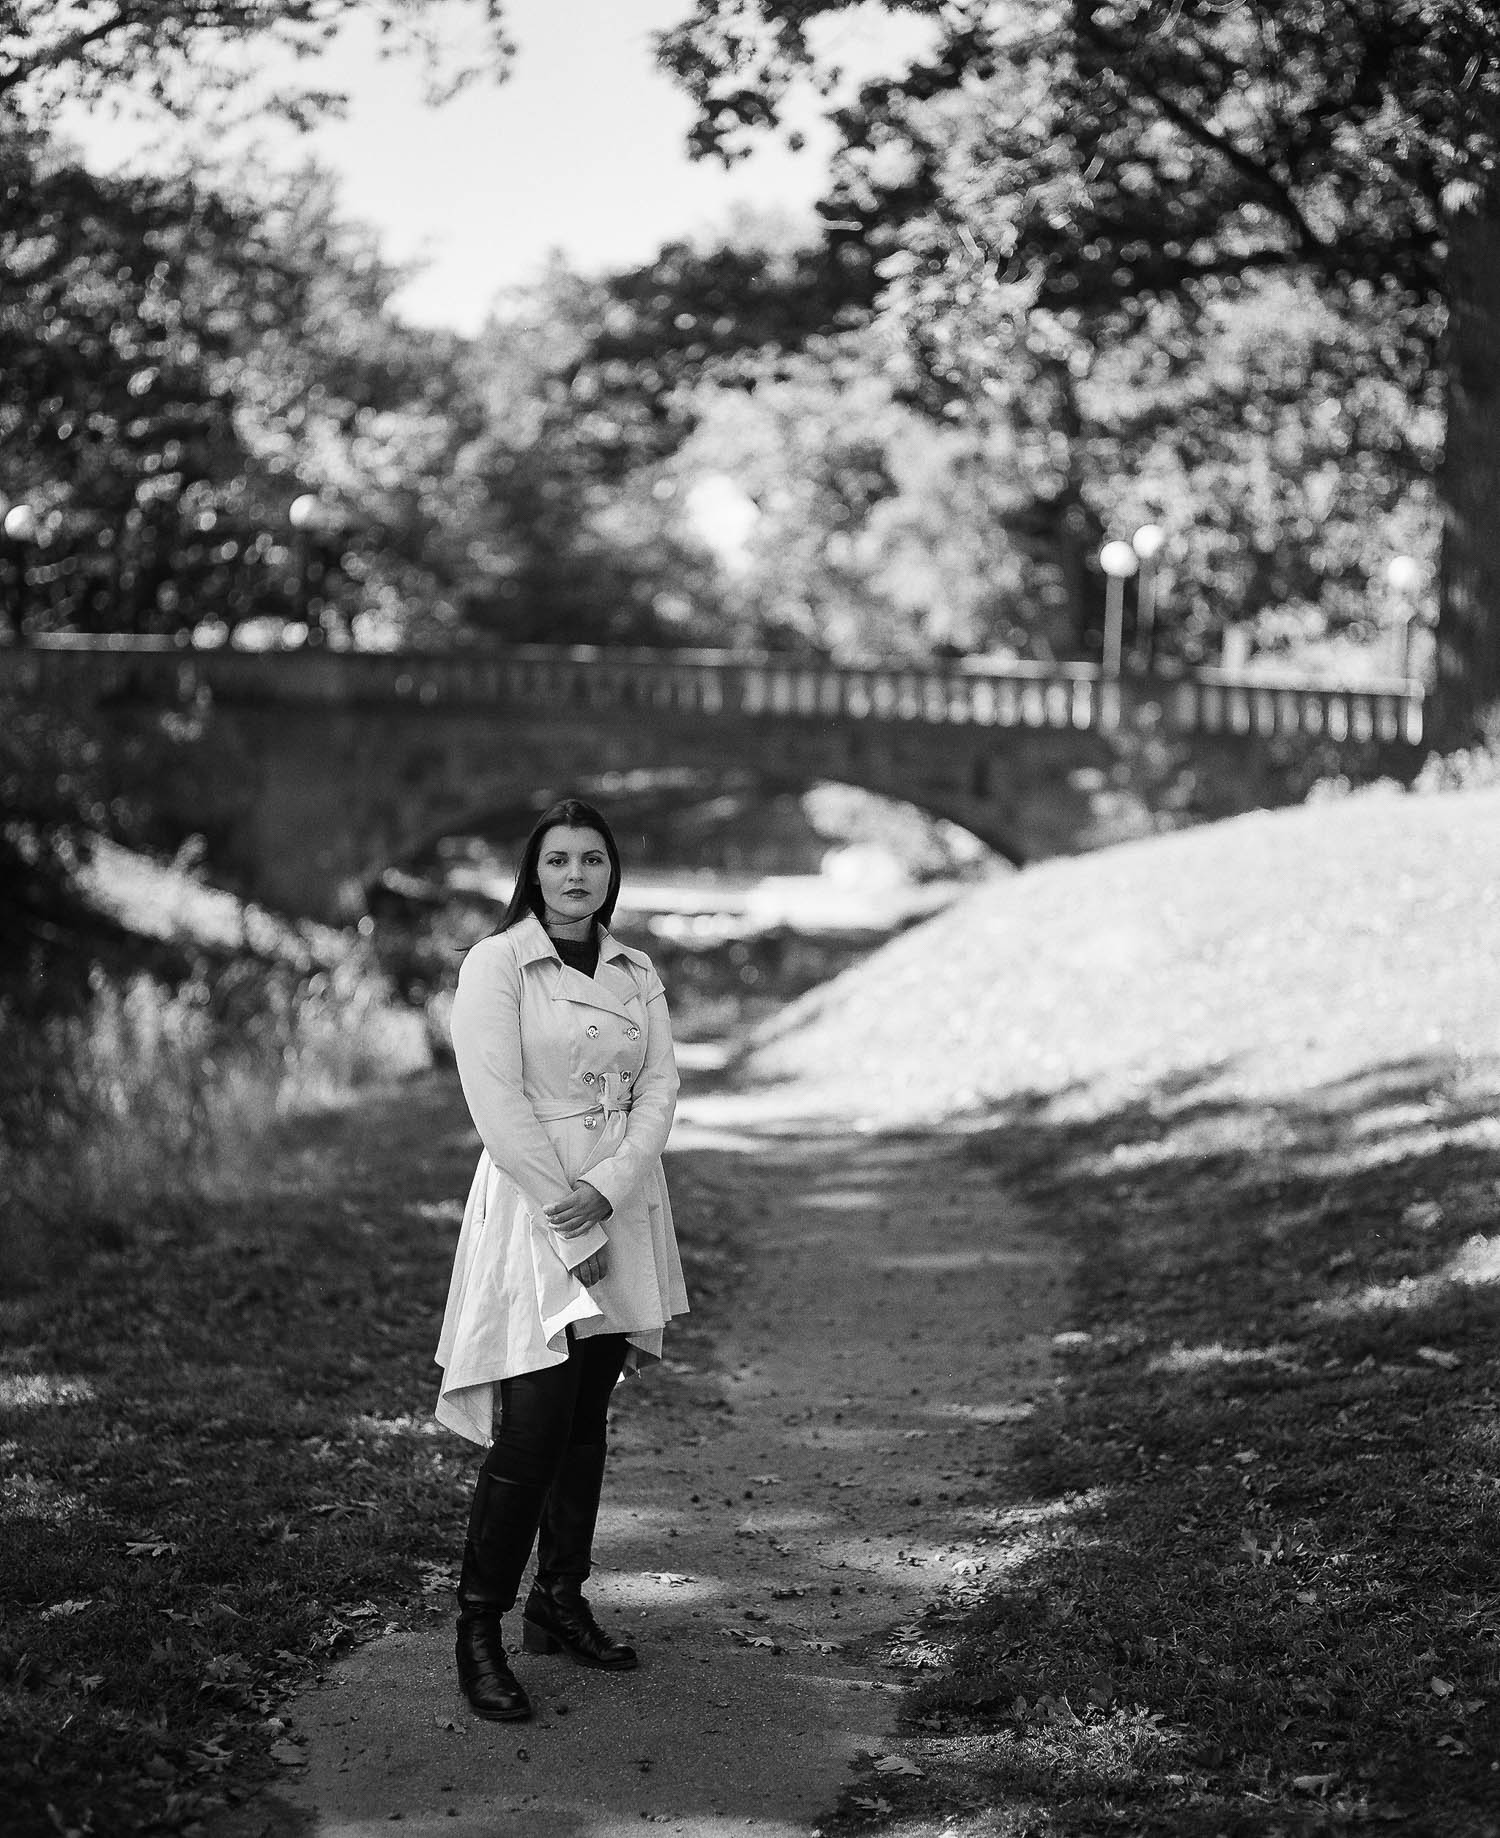 Whitney in front of the bridge of Deering Oaks Park